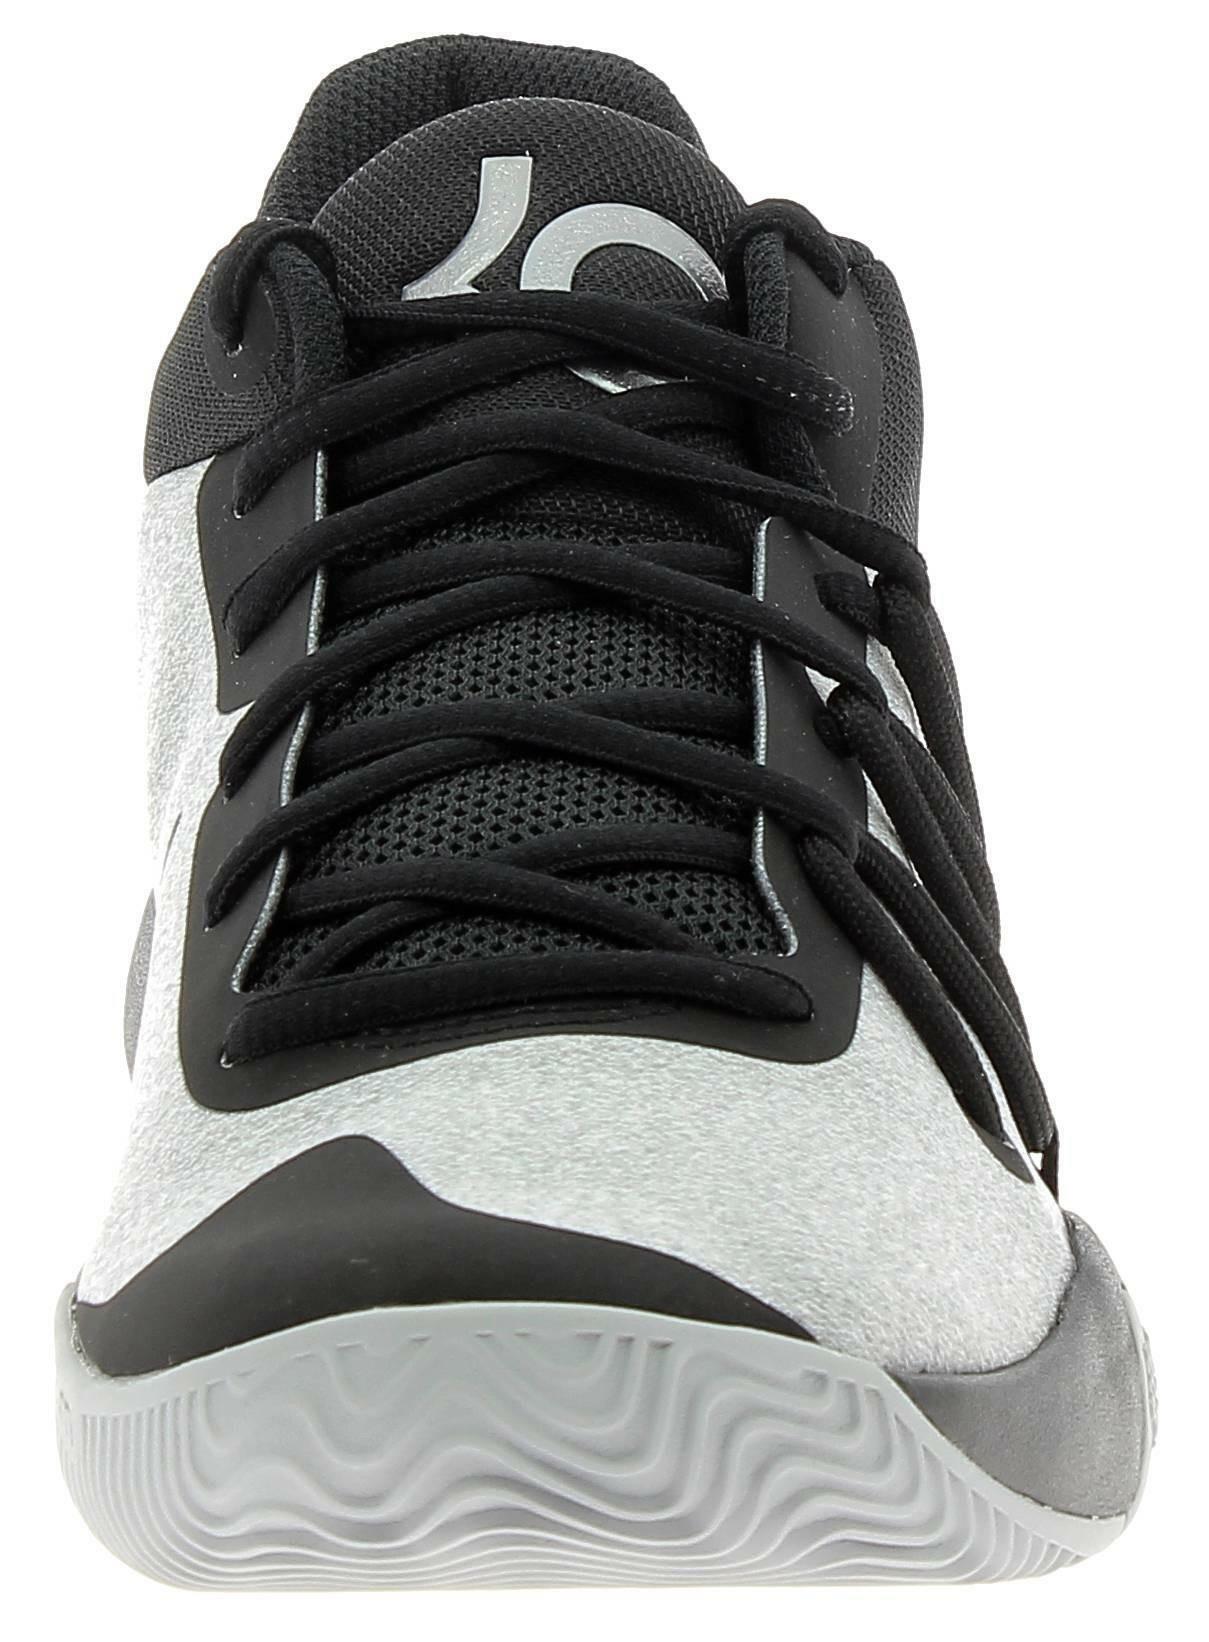 nike nike kd trey 5 v scarpe basket uomo grigie e nere